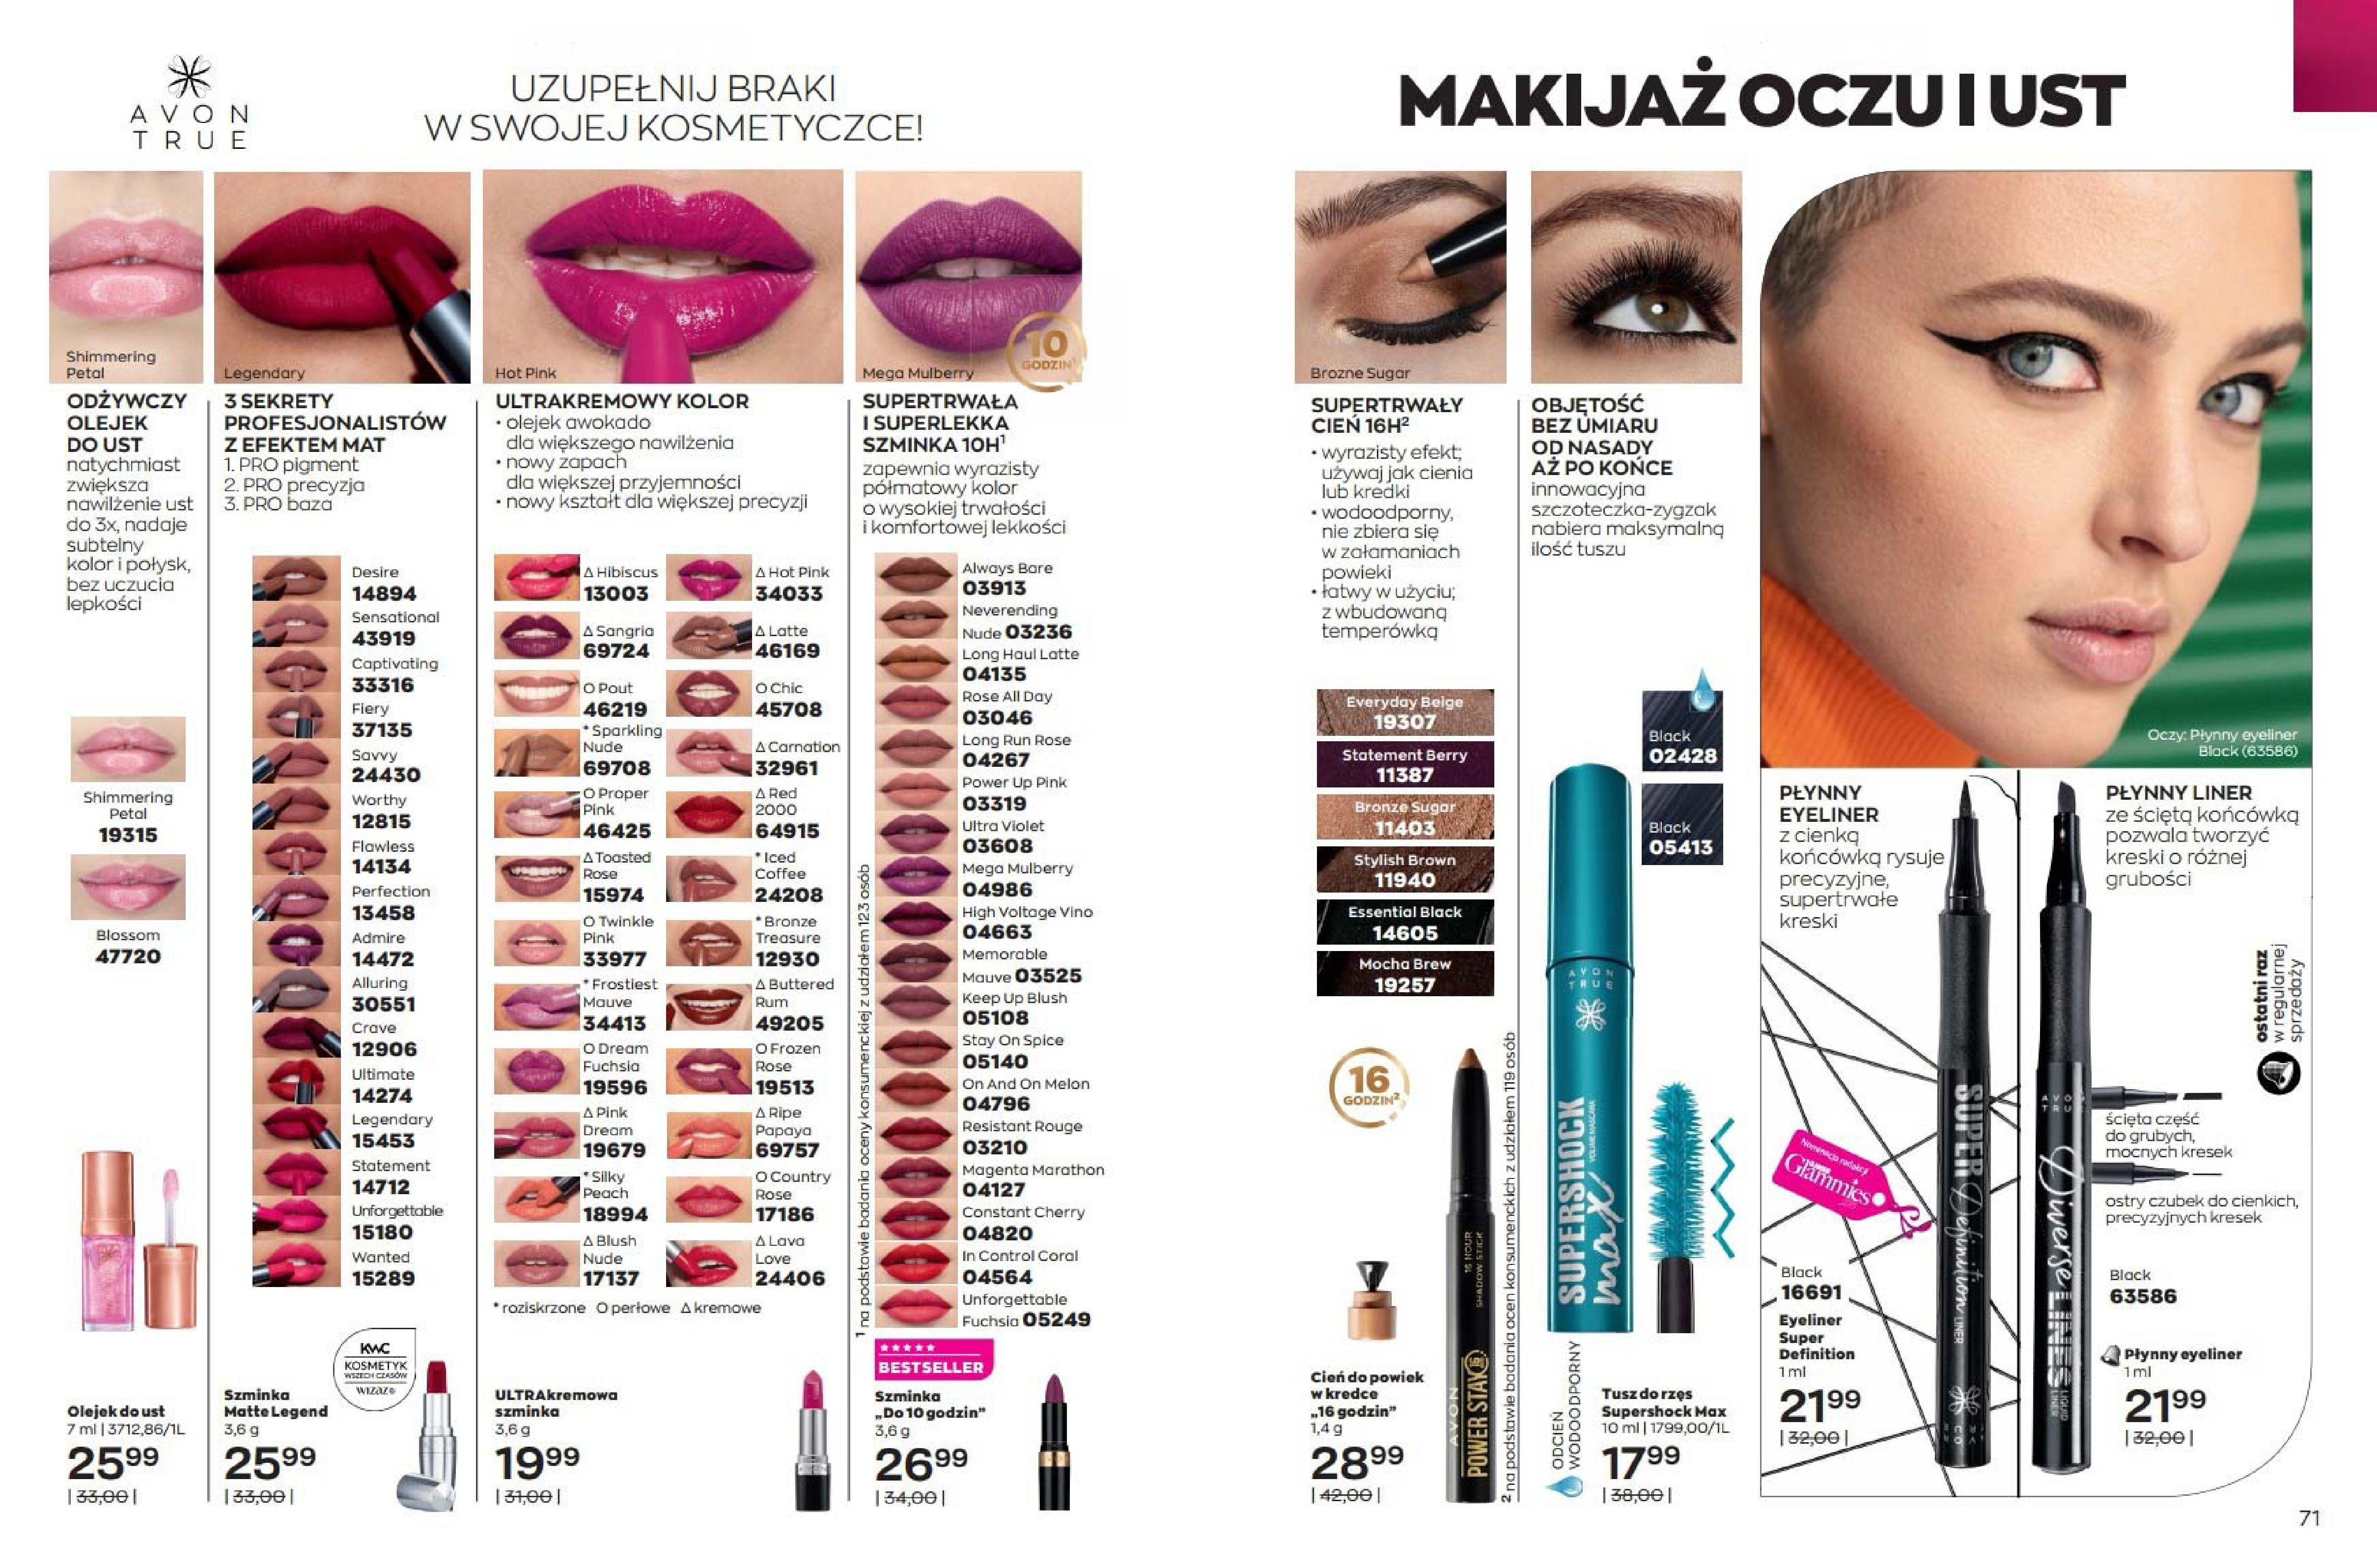 Gazetka Avon: Katalog Avon Wrzesień 2021 2021-09-01 page-36